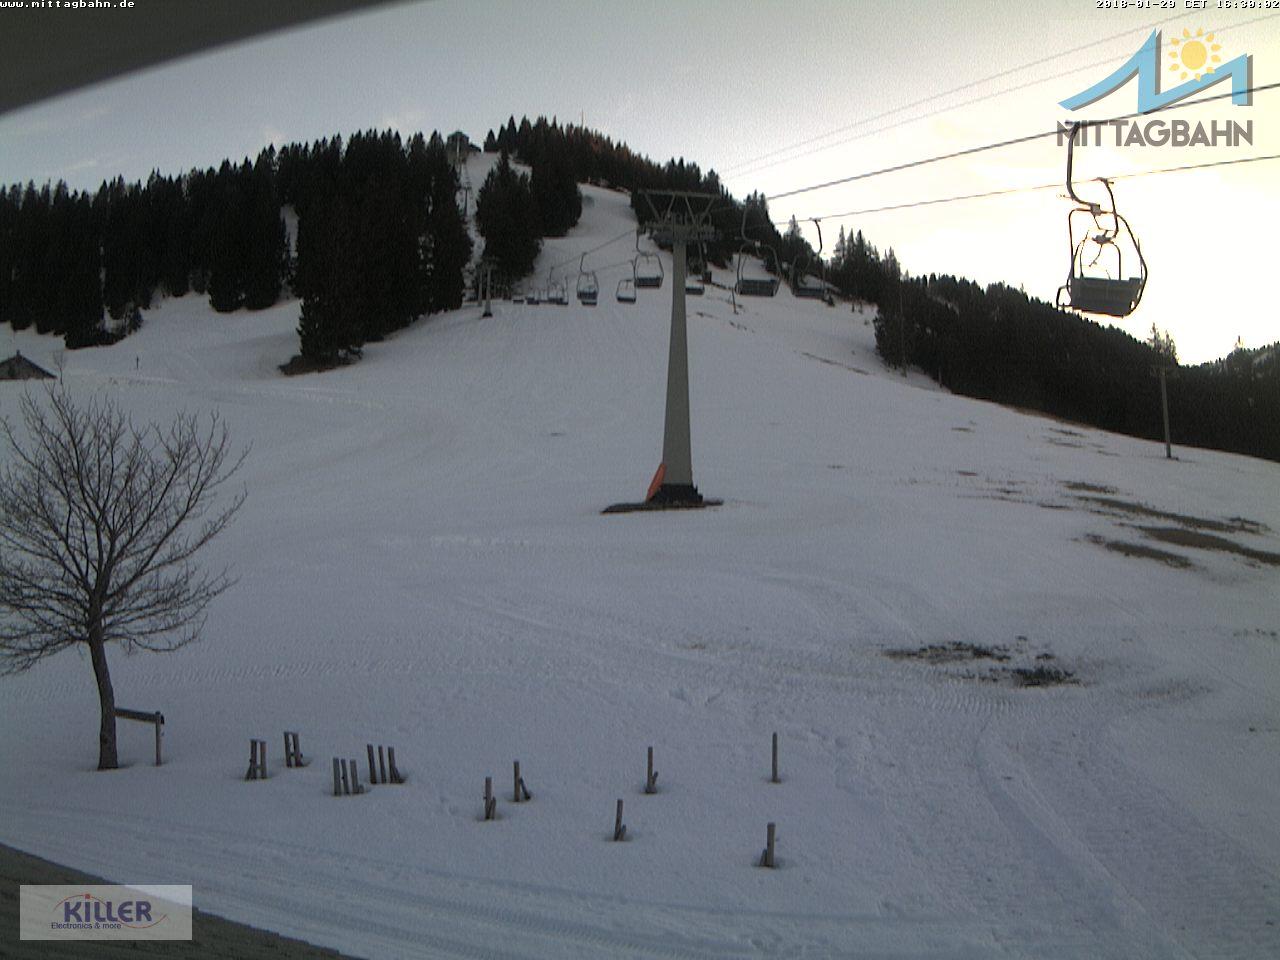 Webcam Ski Resort Immenstadt - Mittag cam 6 - Bavaria Alps - Allgäu